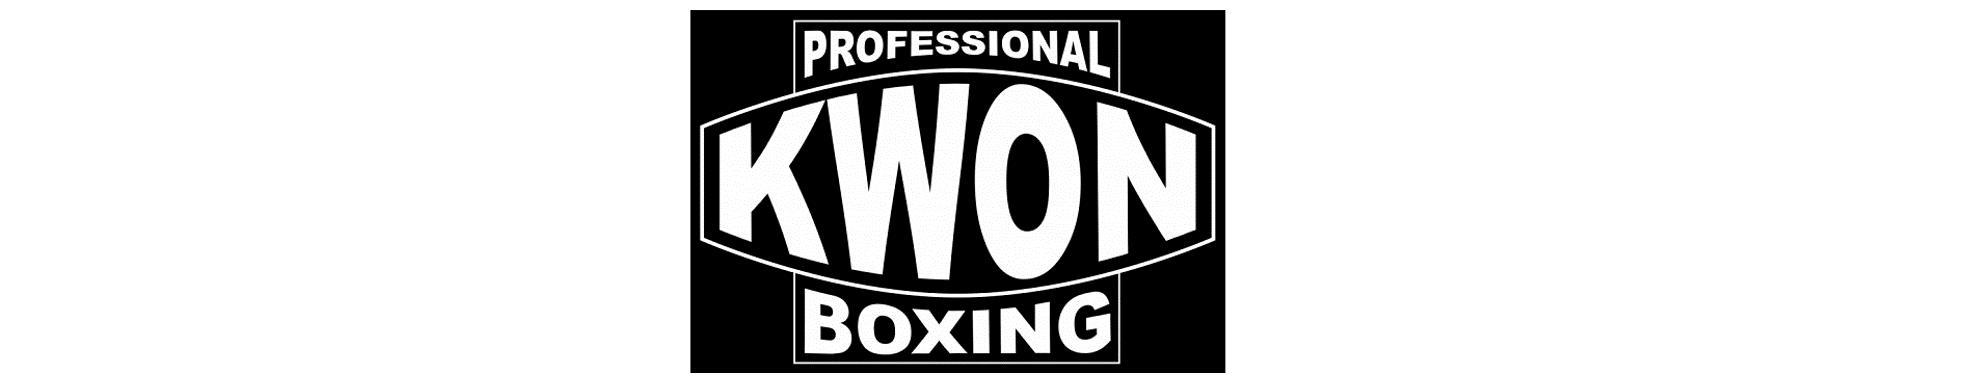 KWON PROFESSIONAL BOXING